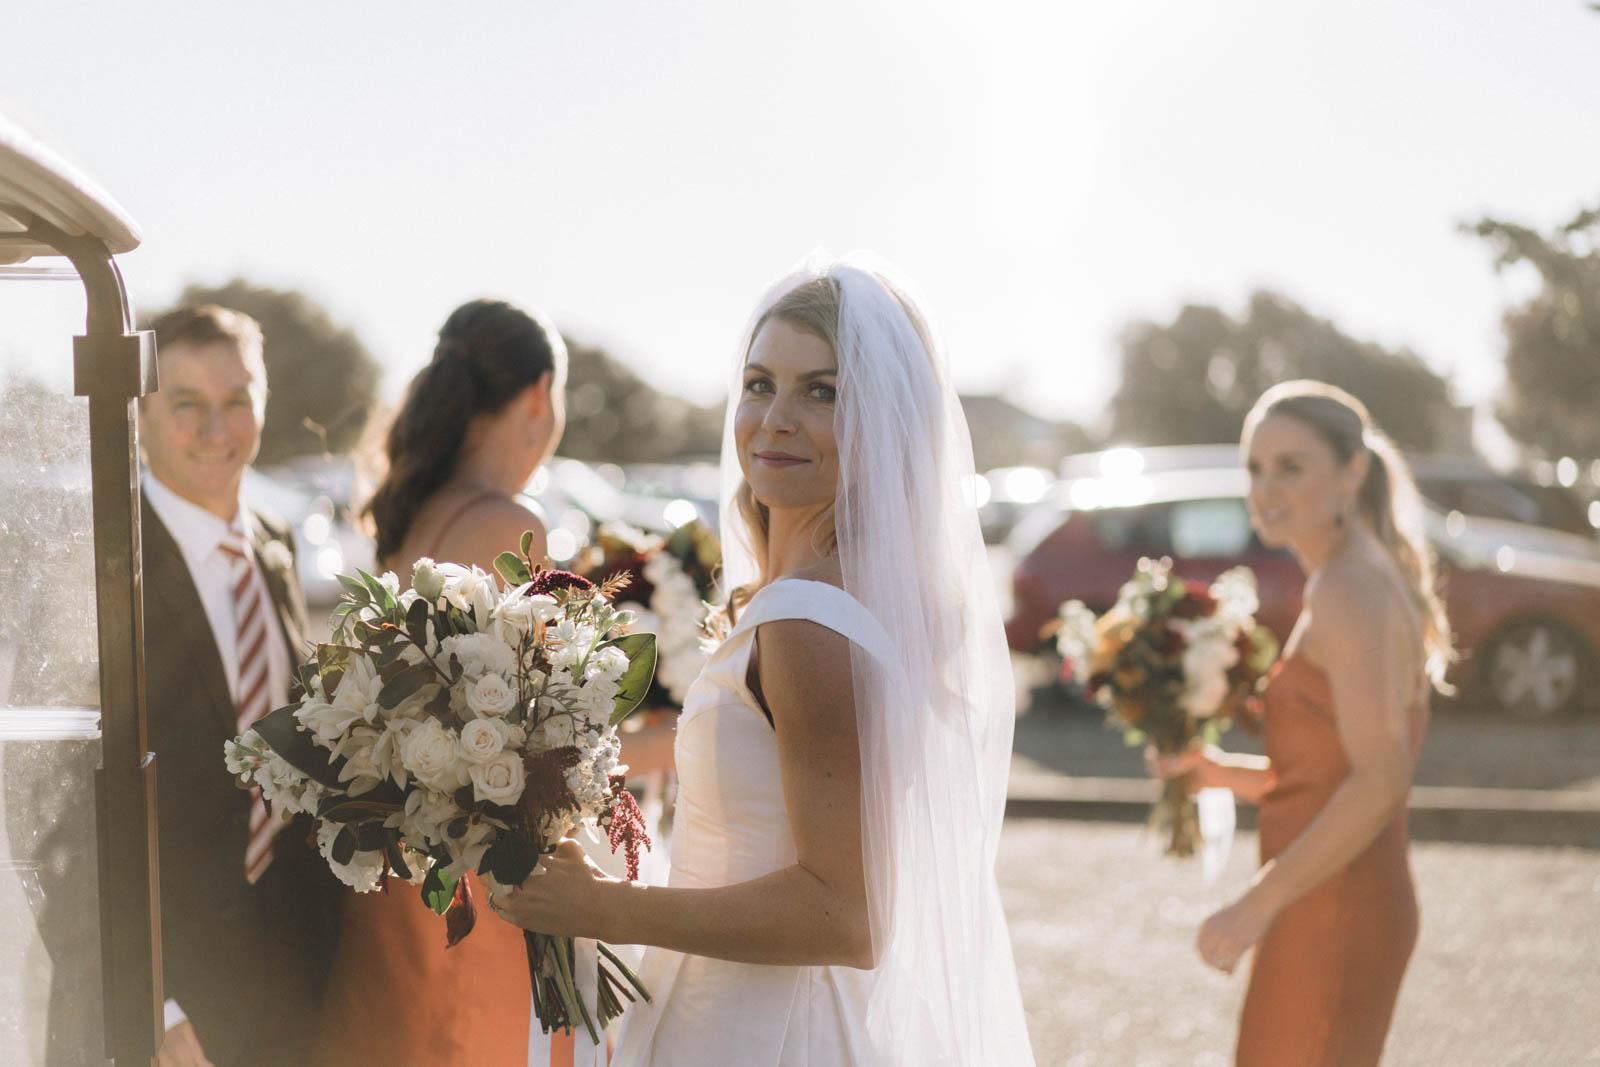 newfound-s-p-mt-maunganui-tauranga-wedding-photographer-1653-A9_06026